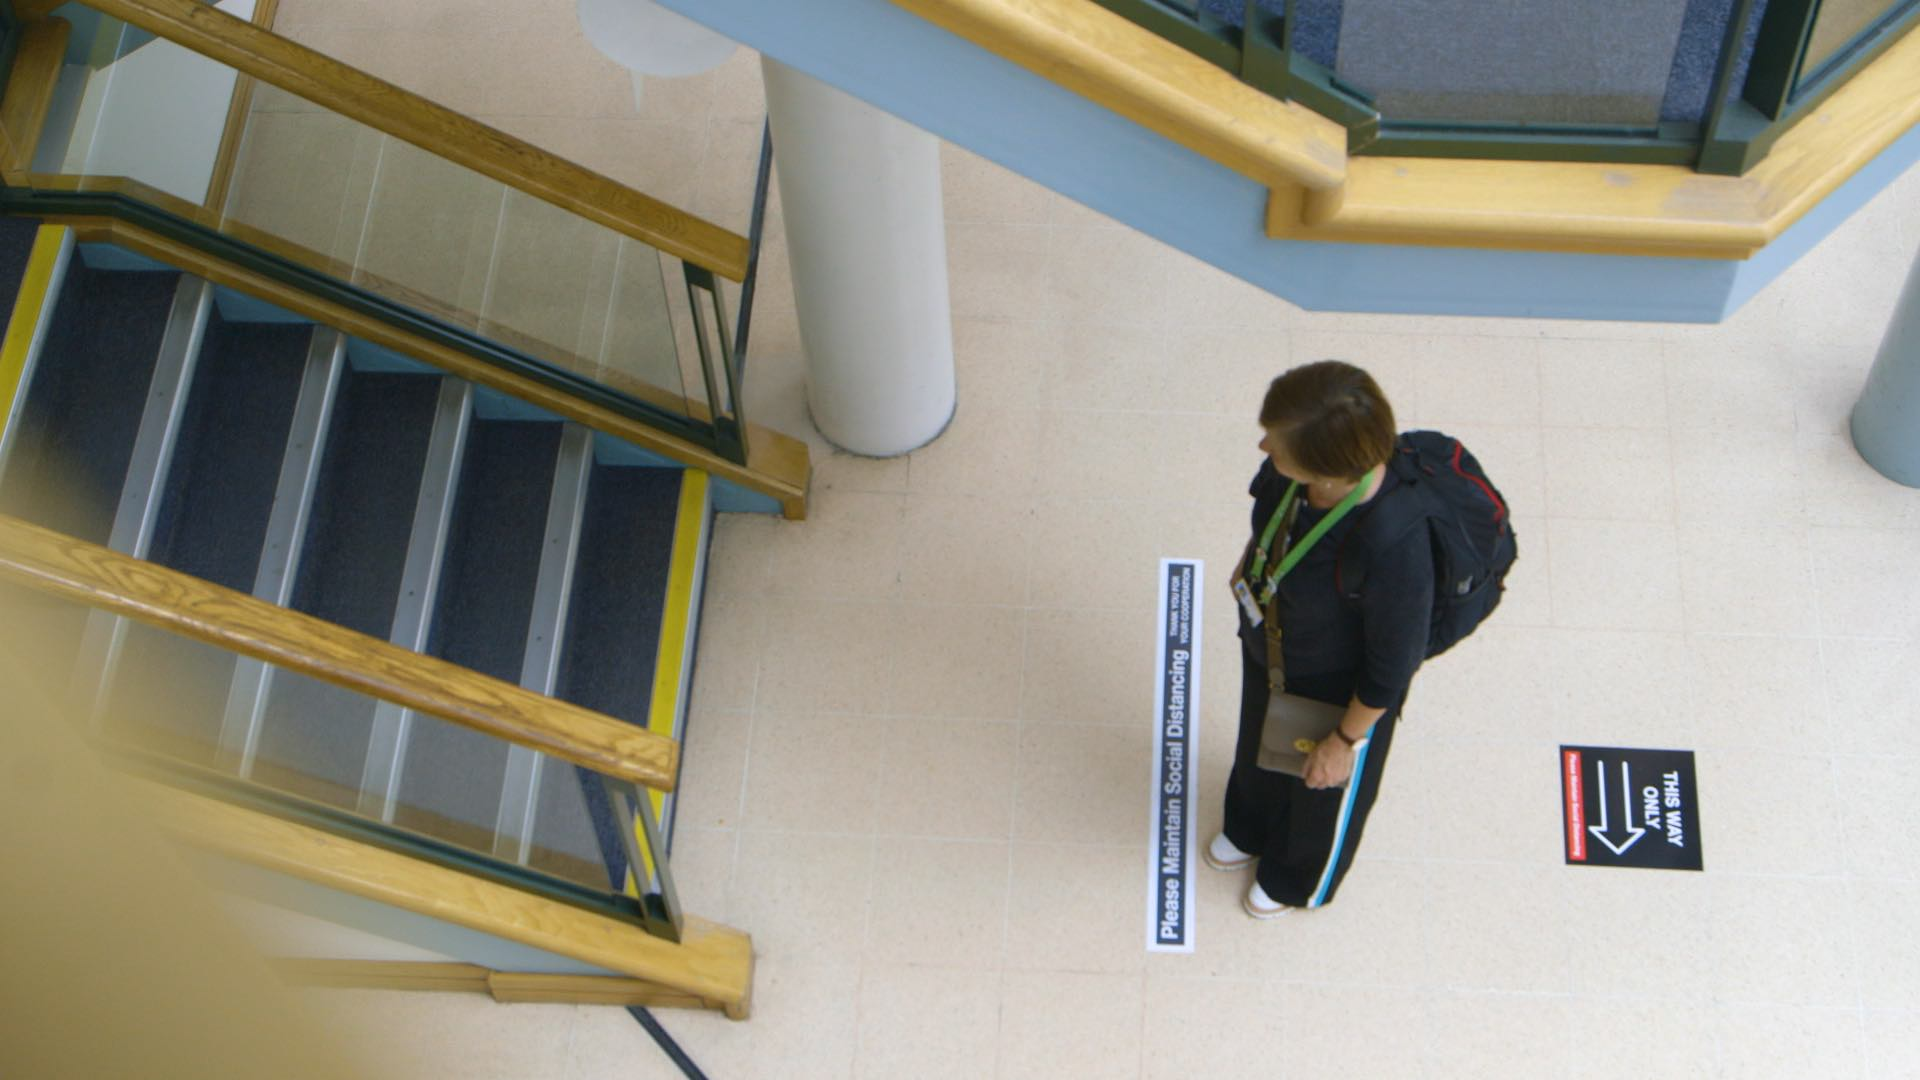 staff safety video production | Magneto Films | London